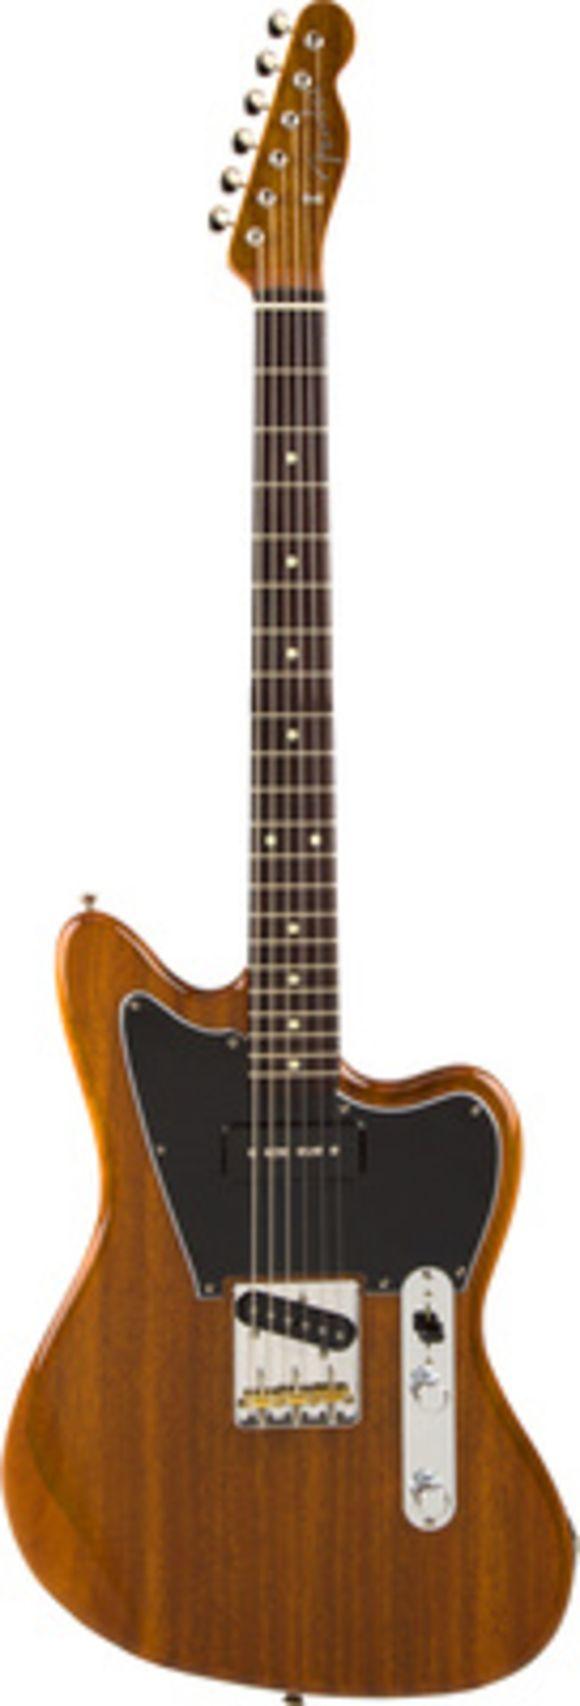 Mahogany Offset Telecaster Fender